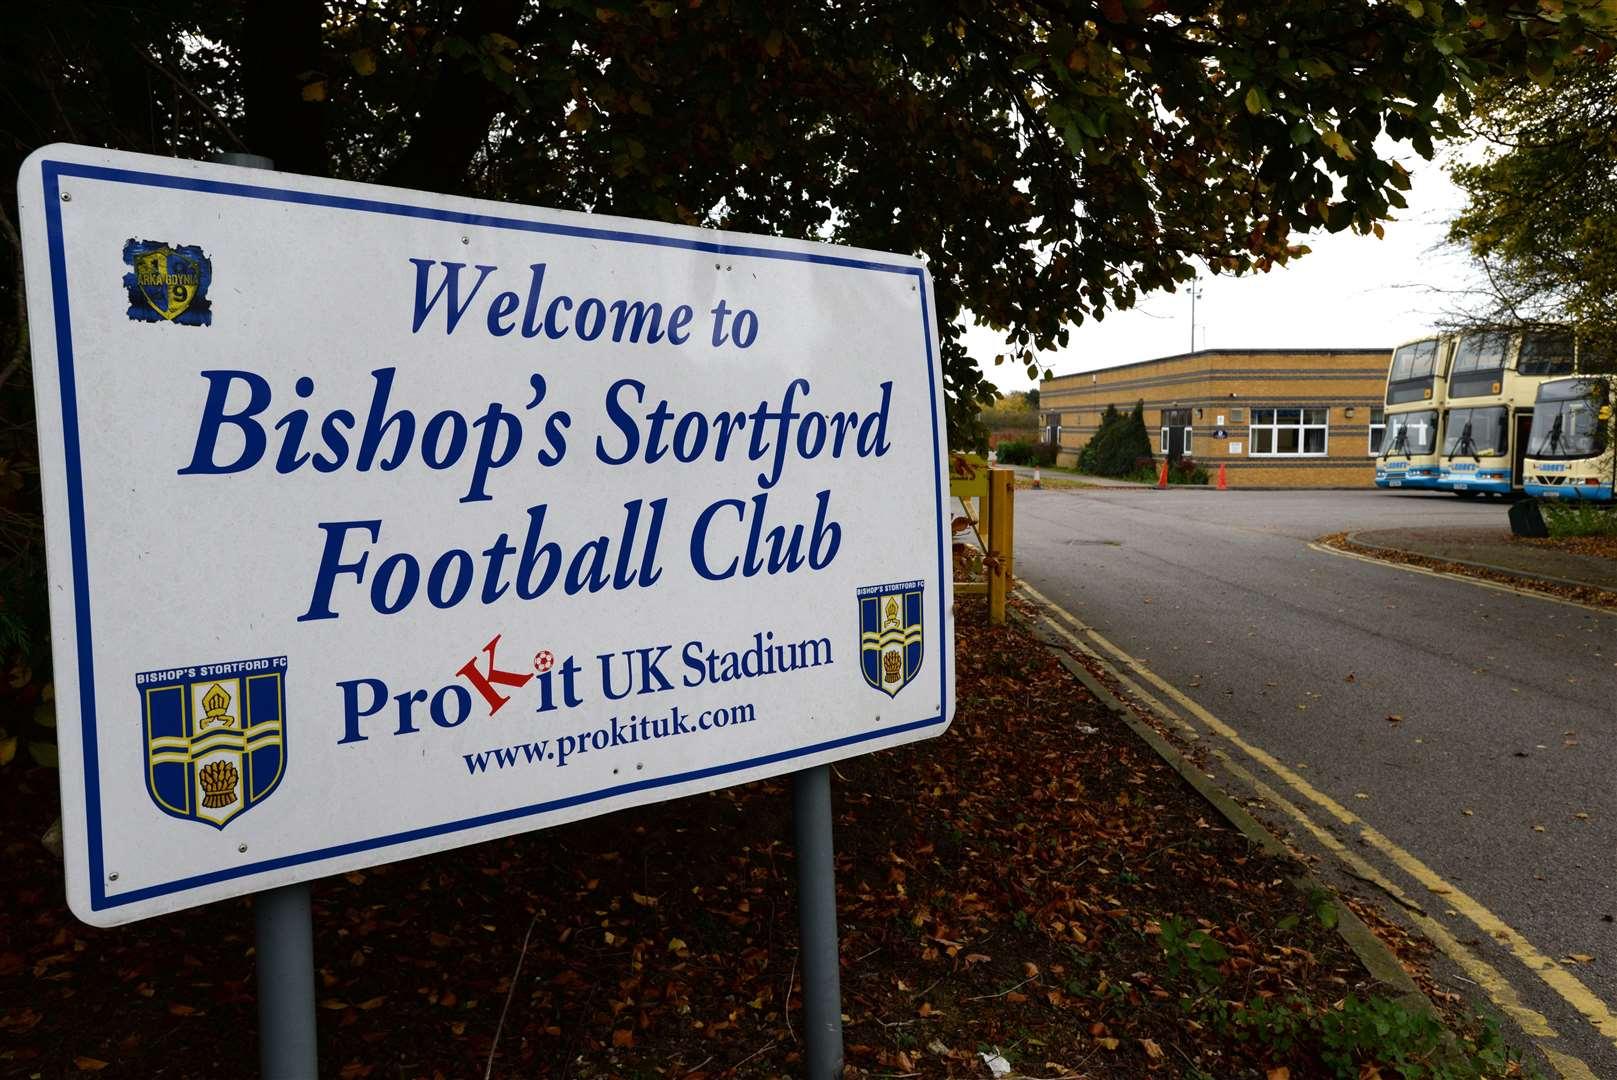 Read the full article - BISHOP'S STORTFORD TIE POSTPONED